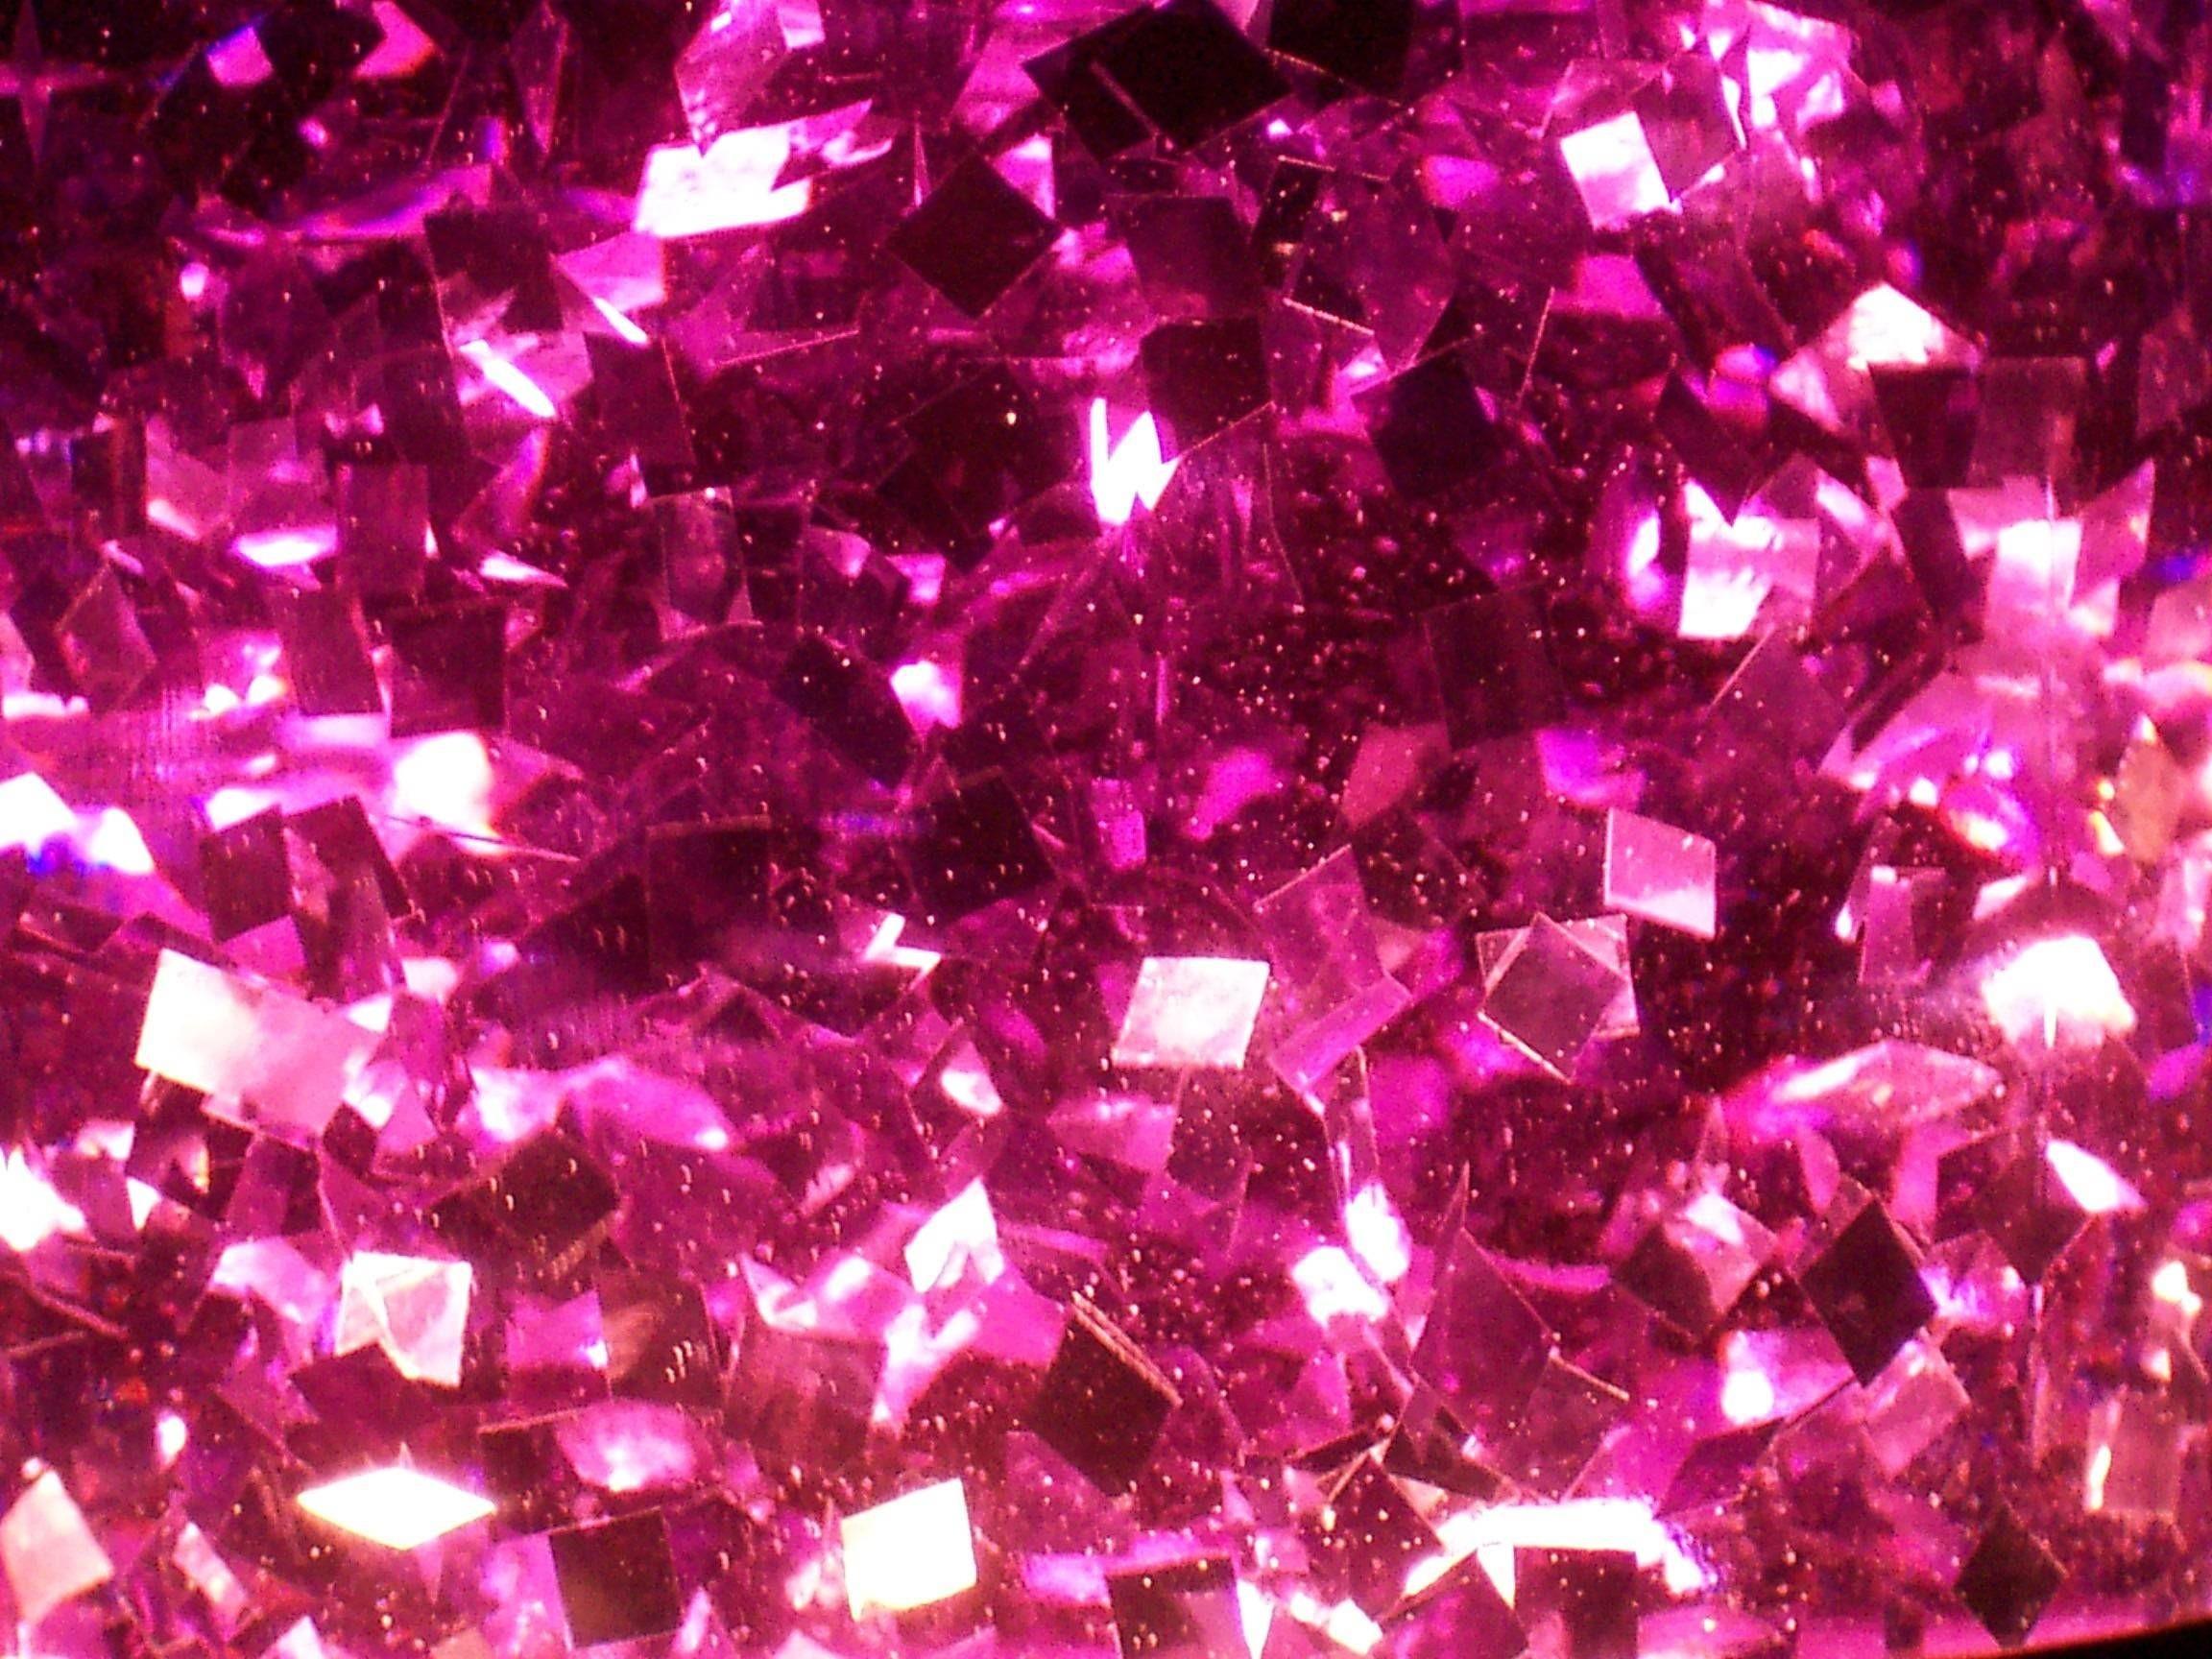 Pink Sparkle Wallpaper (70+ images)